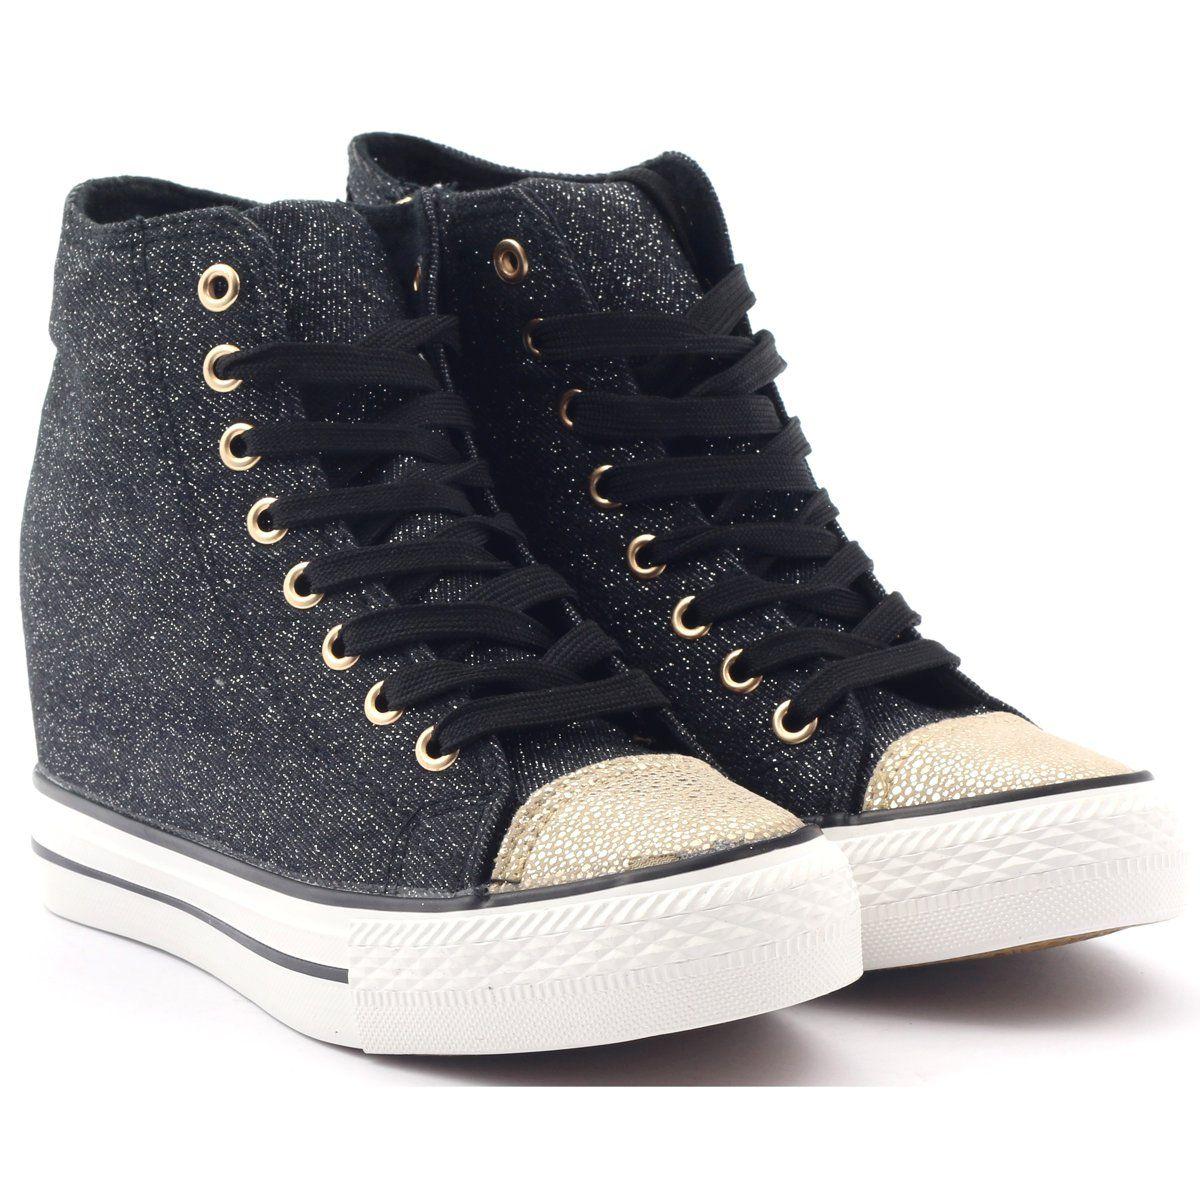 Tenisowki Damskie Mcarthur Zolte Trampki Sneakersy Czarne Mcarthur Sneakers Sneakers Black Women Shoes